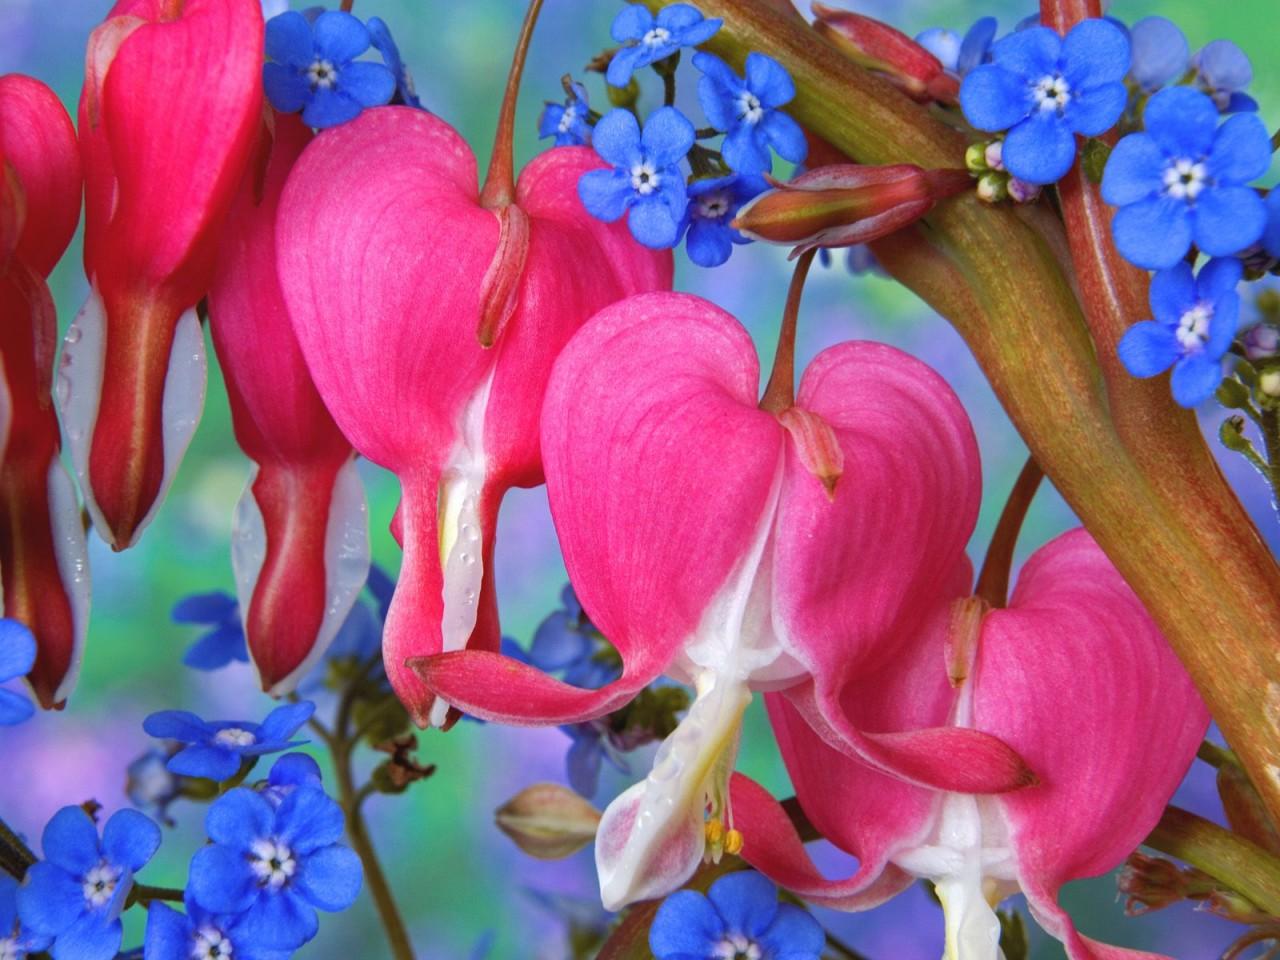 Cute Wallpapers Of Roses Bleeding Heart Flowers Wallpapers Hd Wallpapers Id 5760